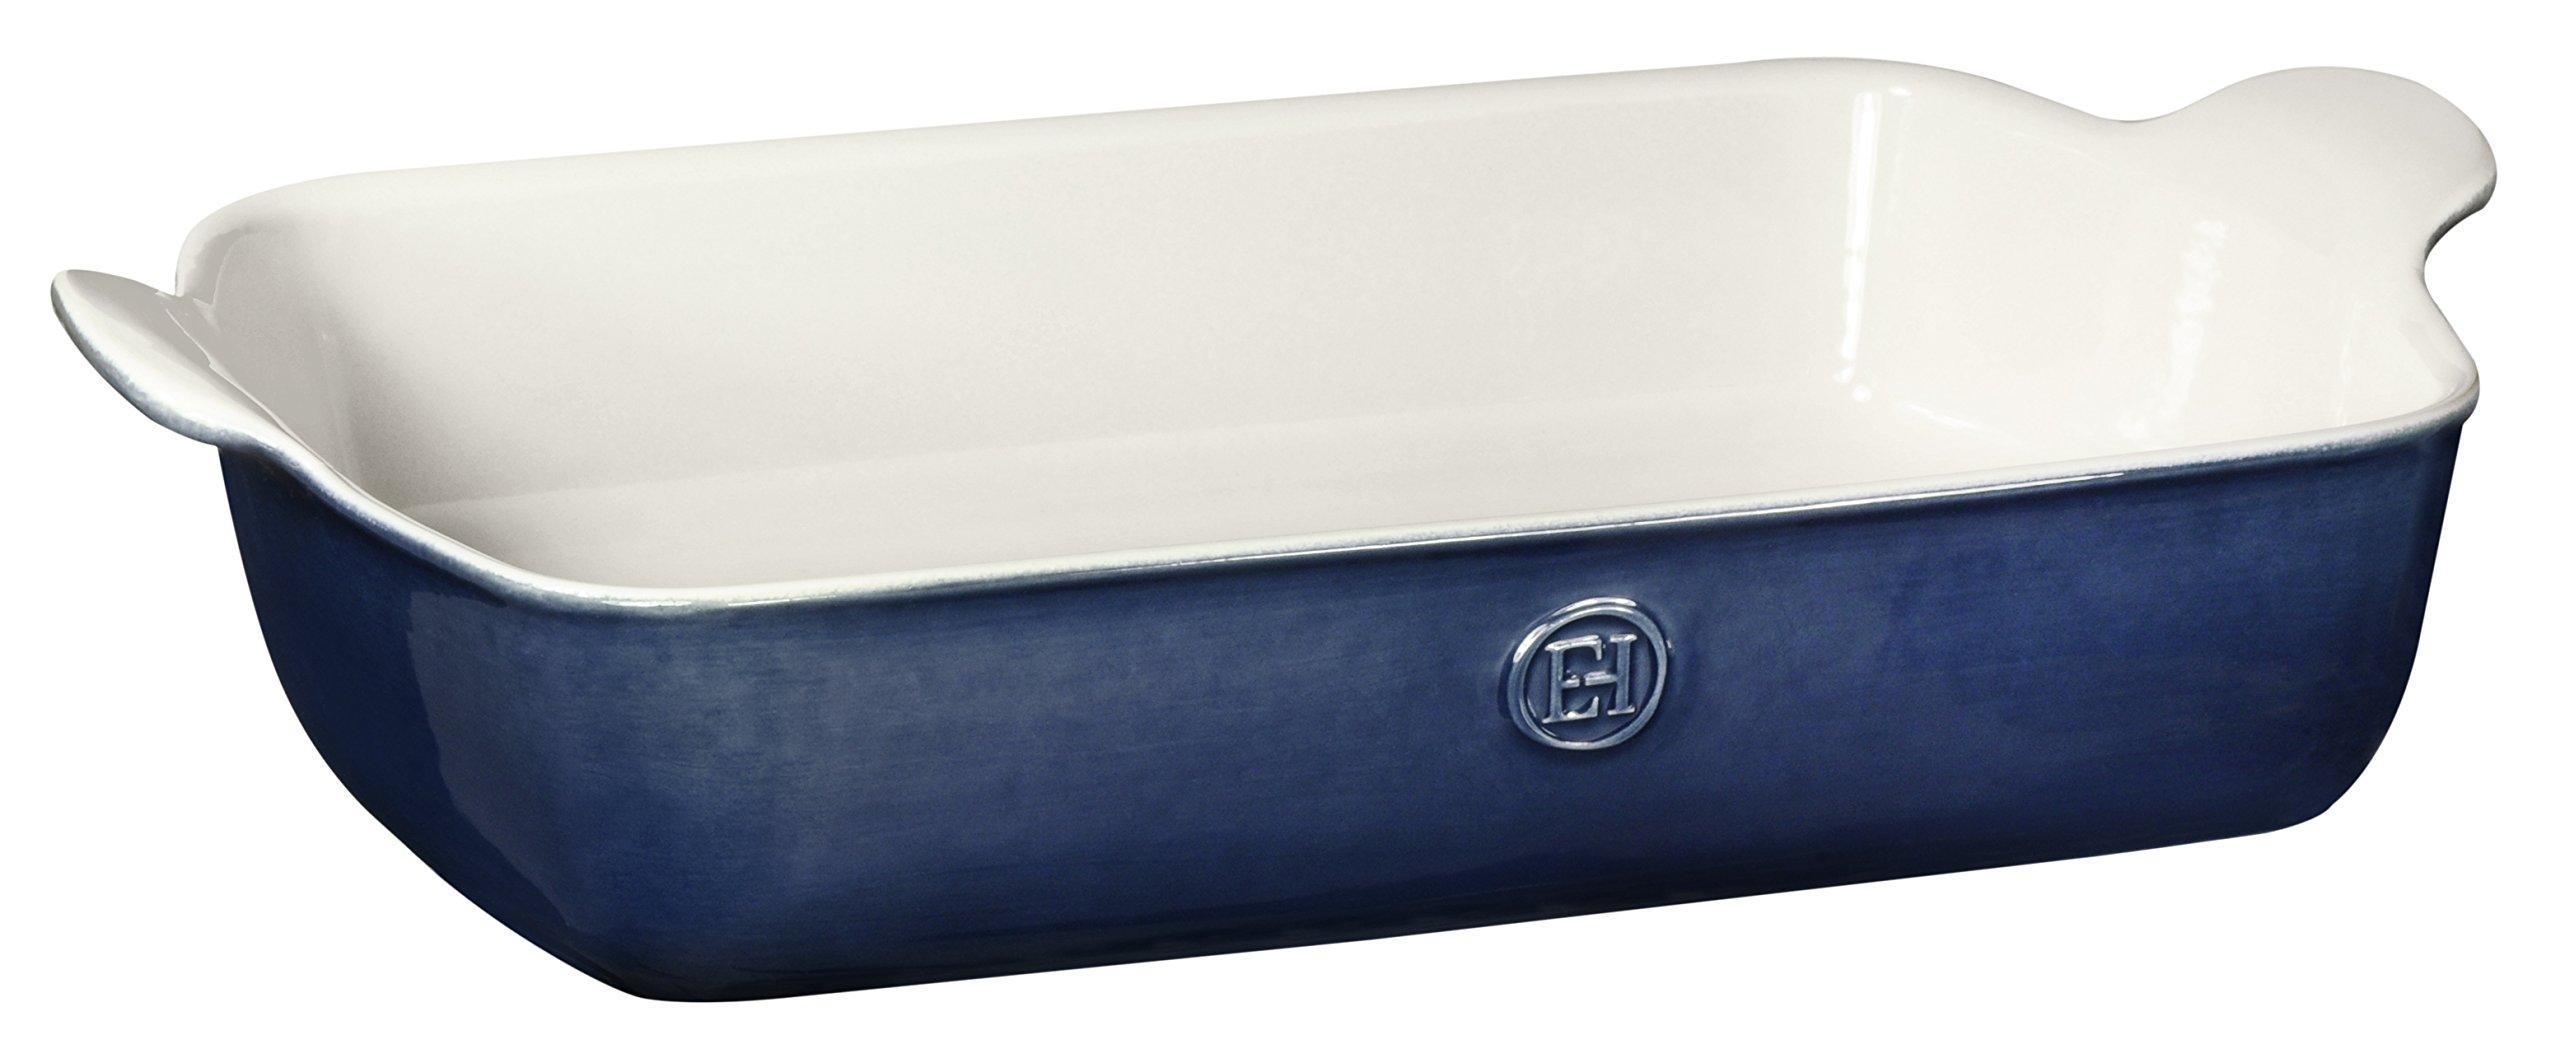 Emile Henry Made In France HR Modern Classics Large Rectangular Baker, 13 x 9, Blue by Emile Henry